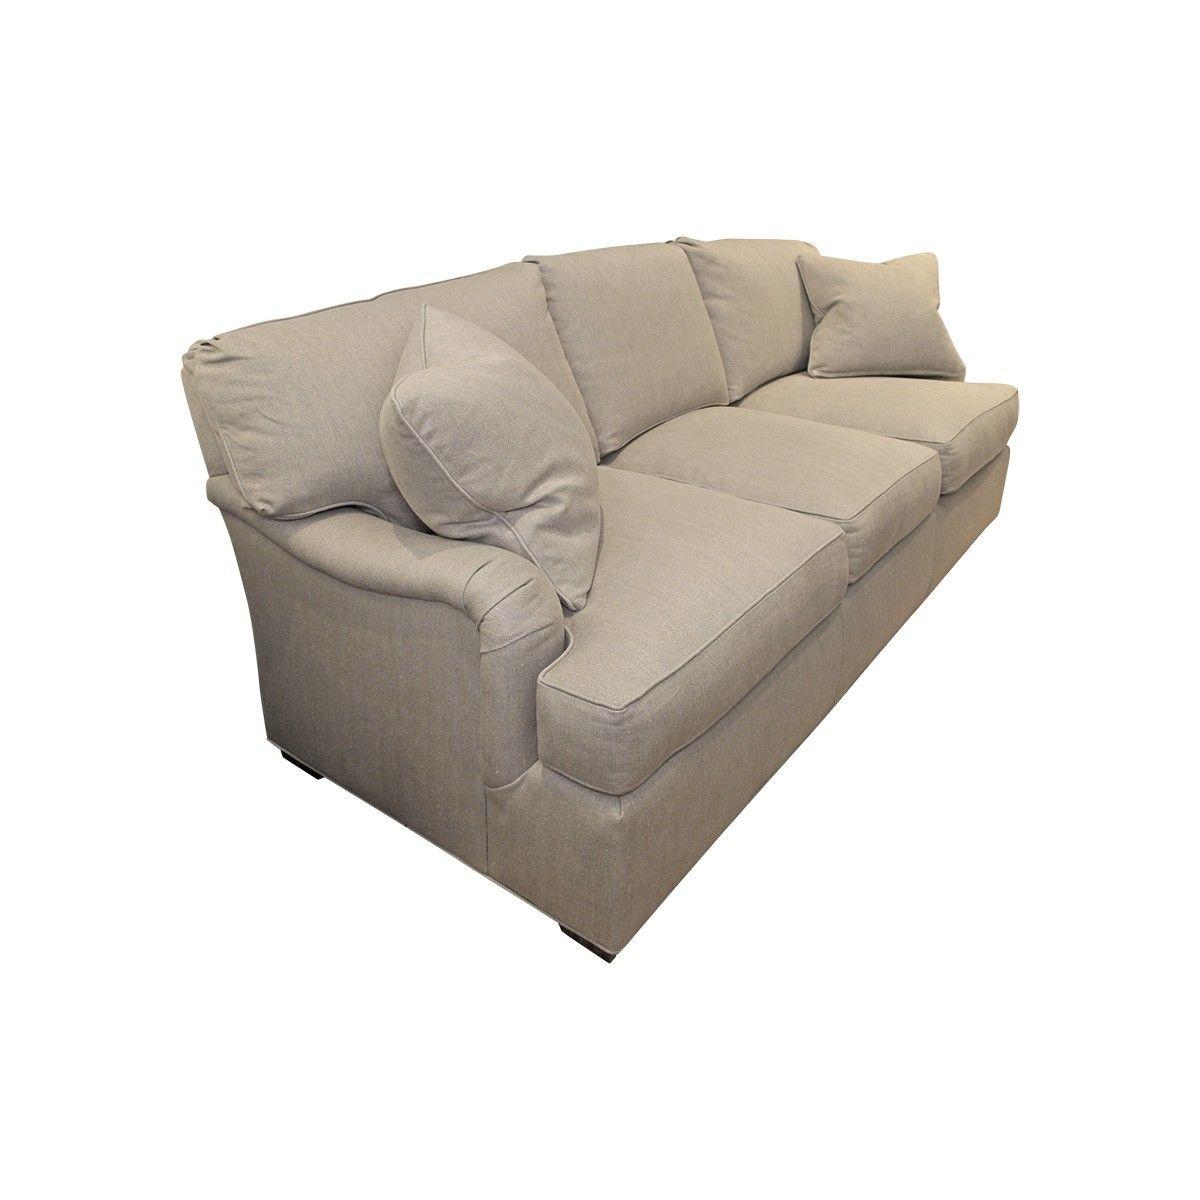 Cool Hickory Chair Custom Linen Sofa Angled View Beach Street Inzonedesignstudio Interior Chair Design Inzonedesignstudiocom